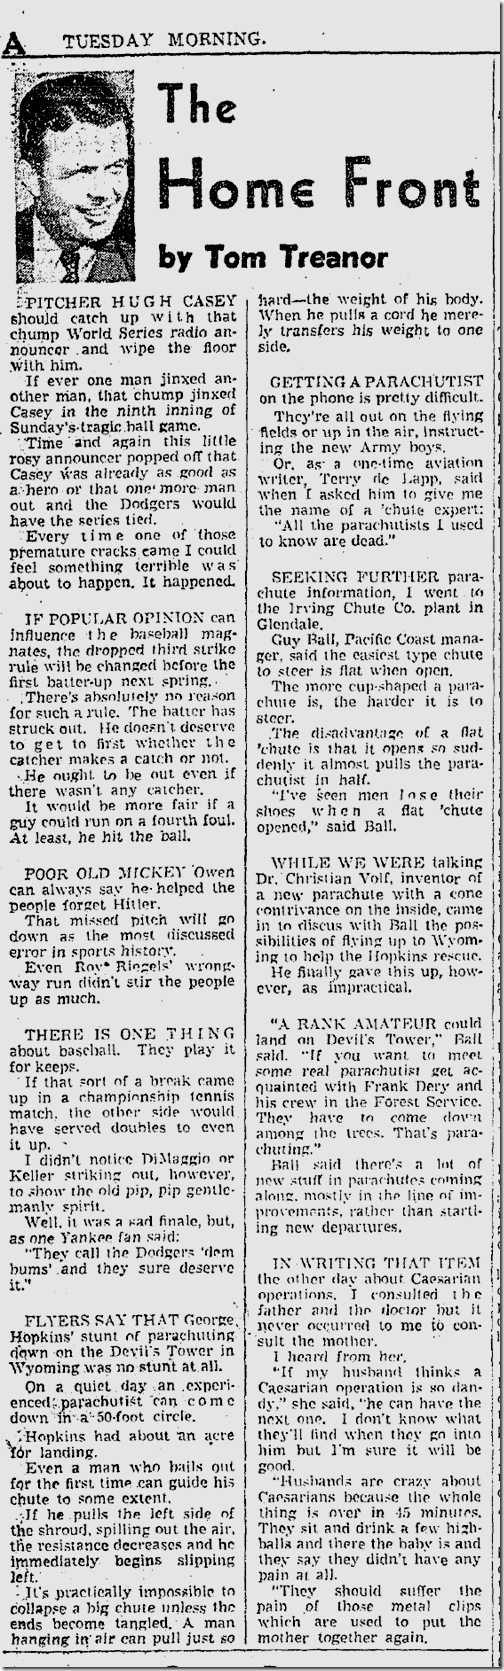 Oct. 7, 1941, Tom Treanor